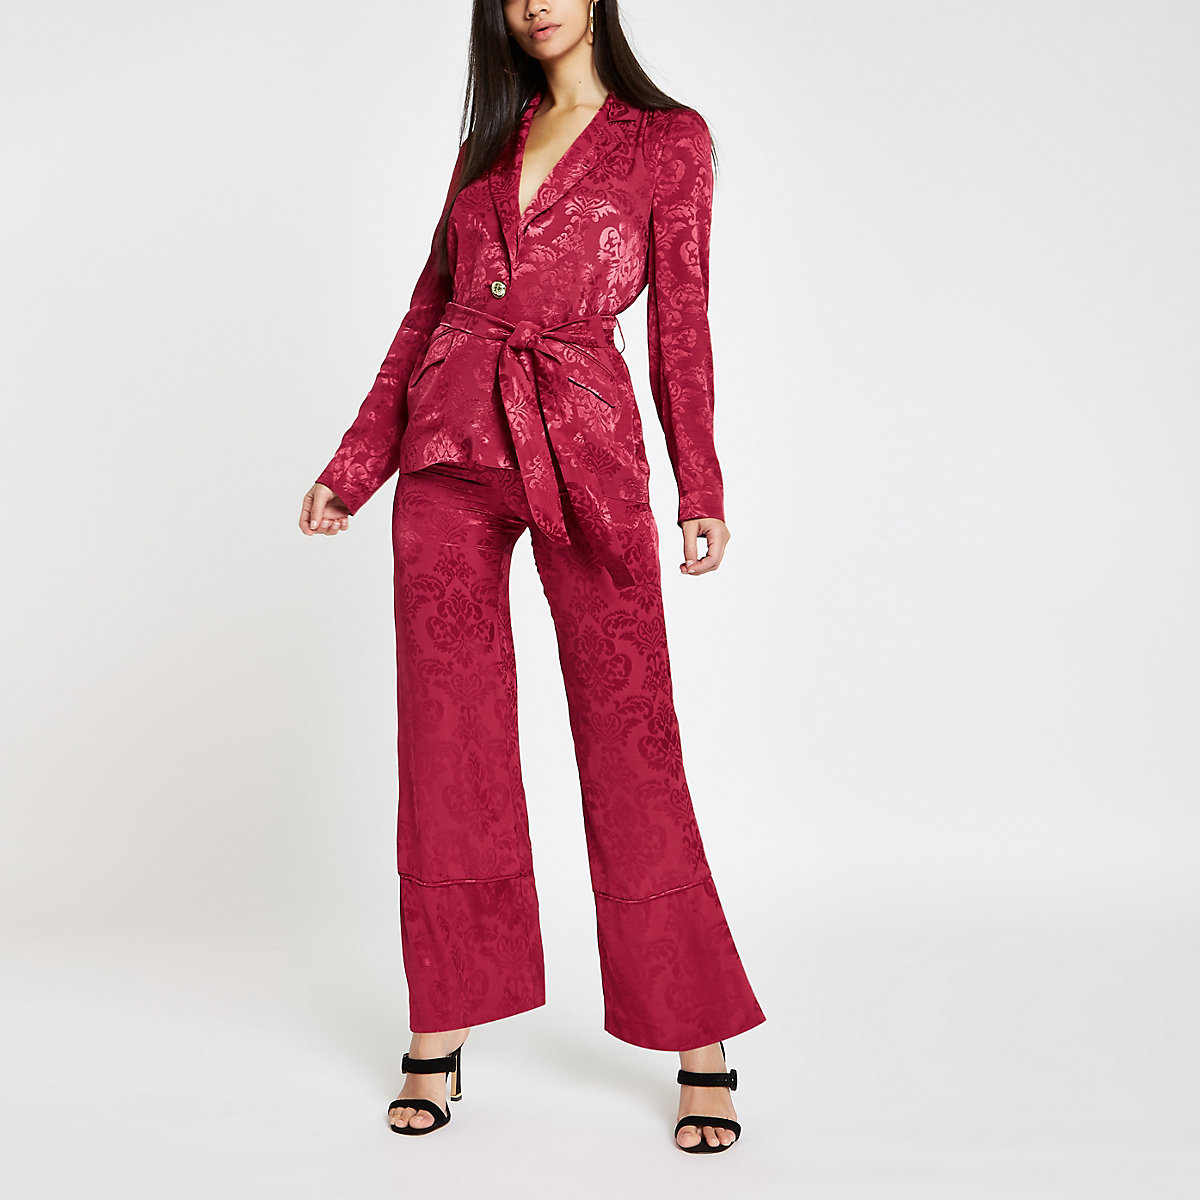 Pink jacquard wide leg pants